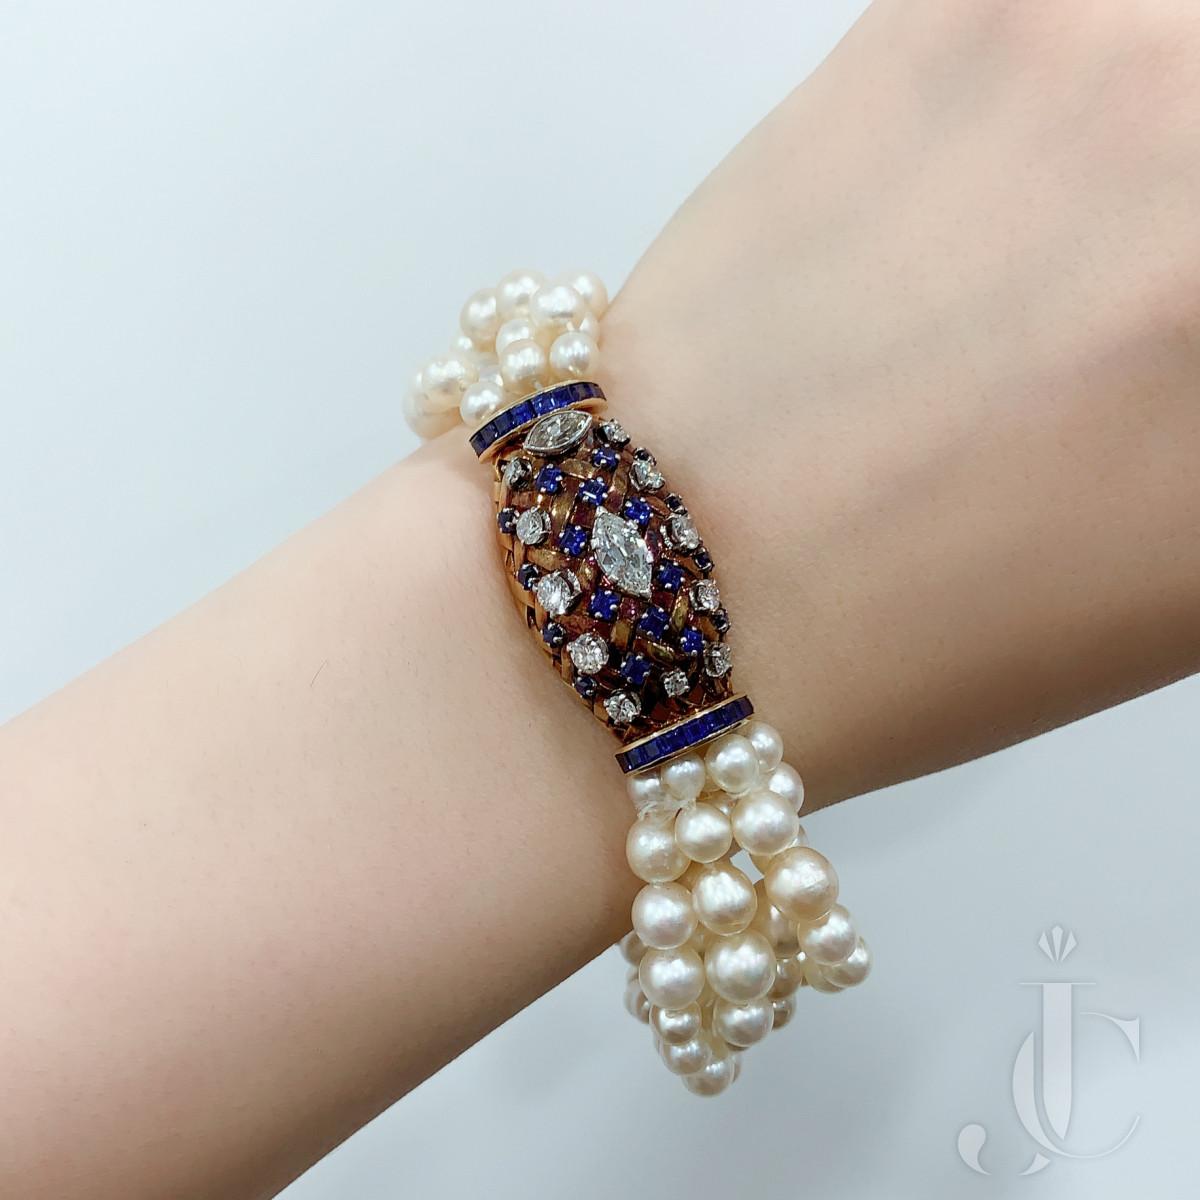 18k gold, sapphire, diamond and pearl bracelet by René Boivin